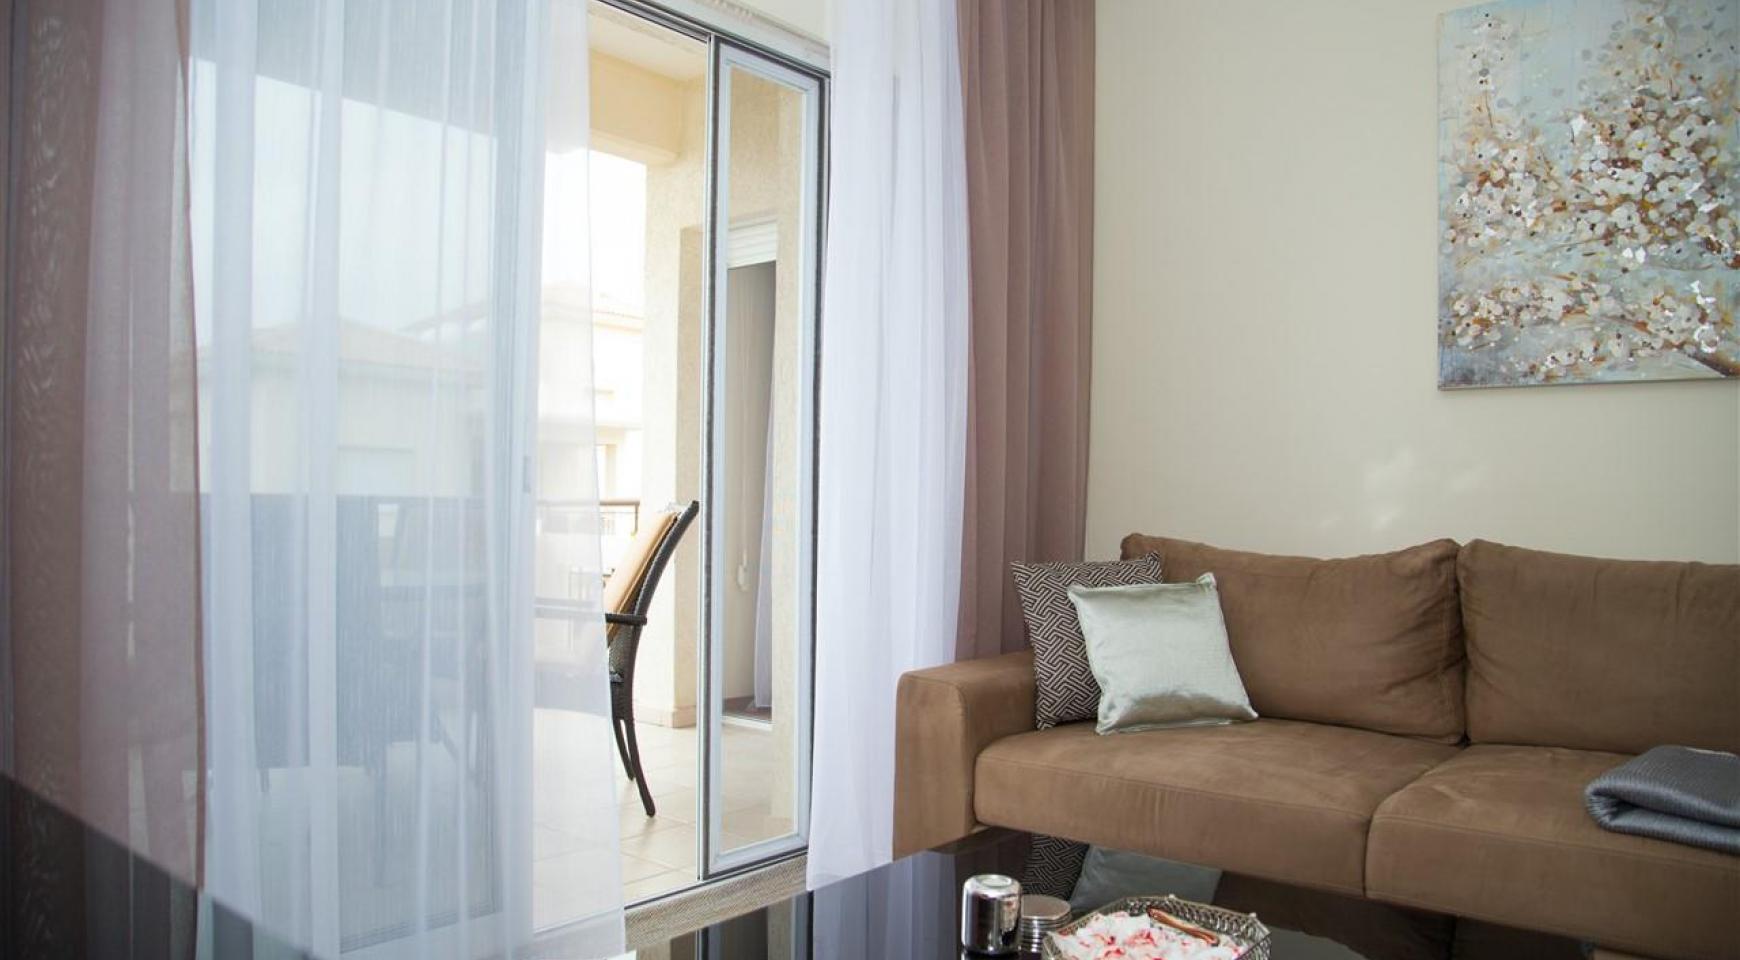 Luxury 2 Bedroom Apartment Mesogios Iris 304 in the Tourist area near the Beach - 4